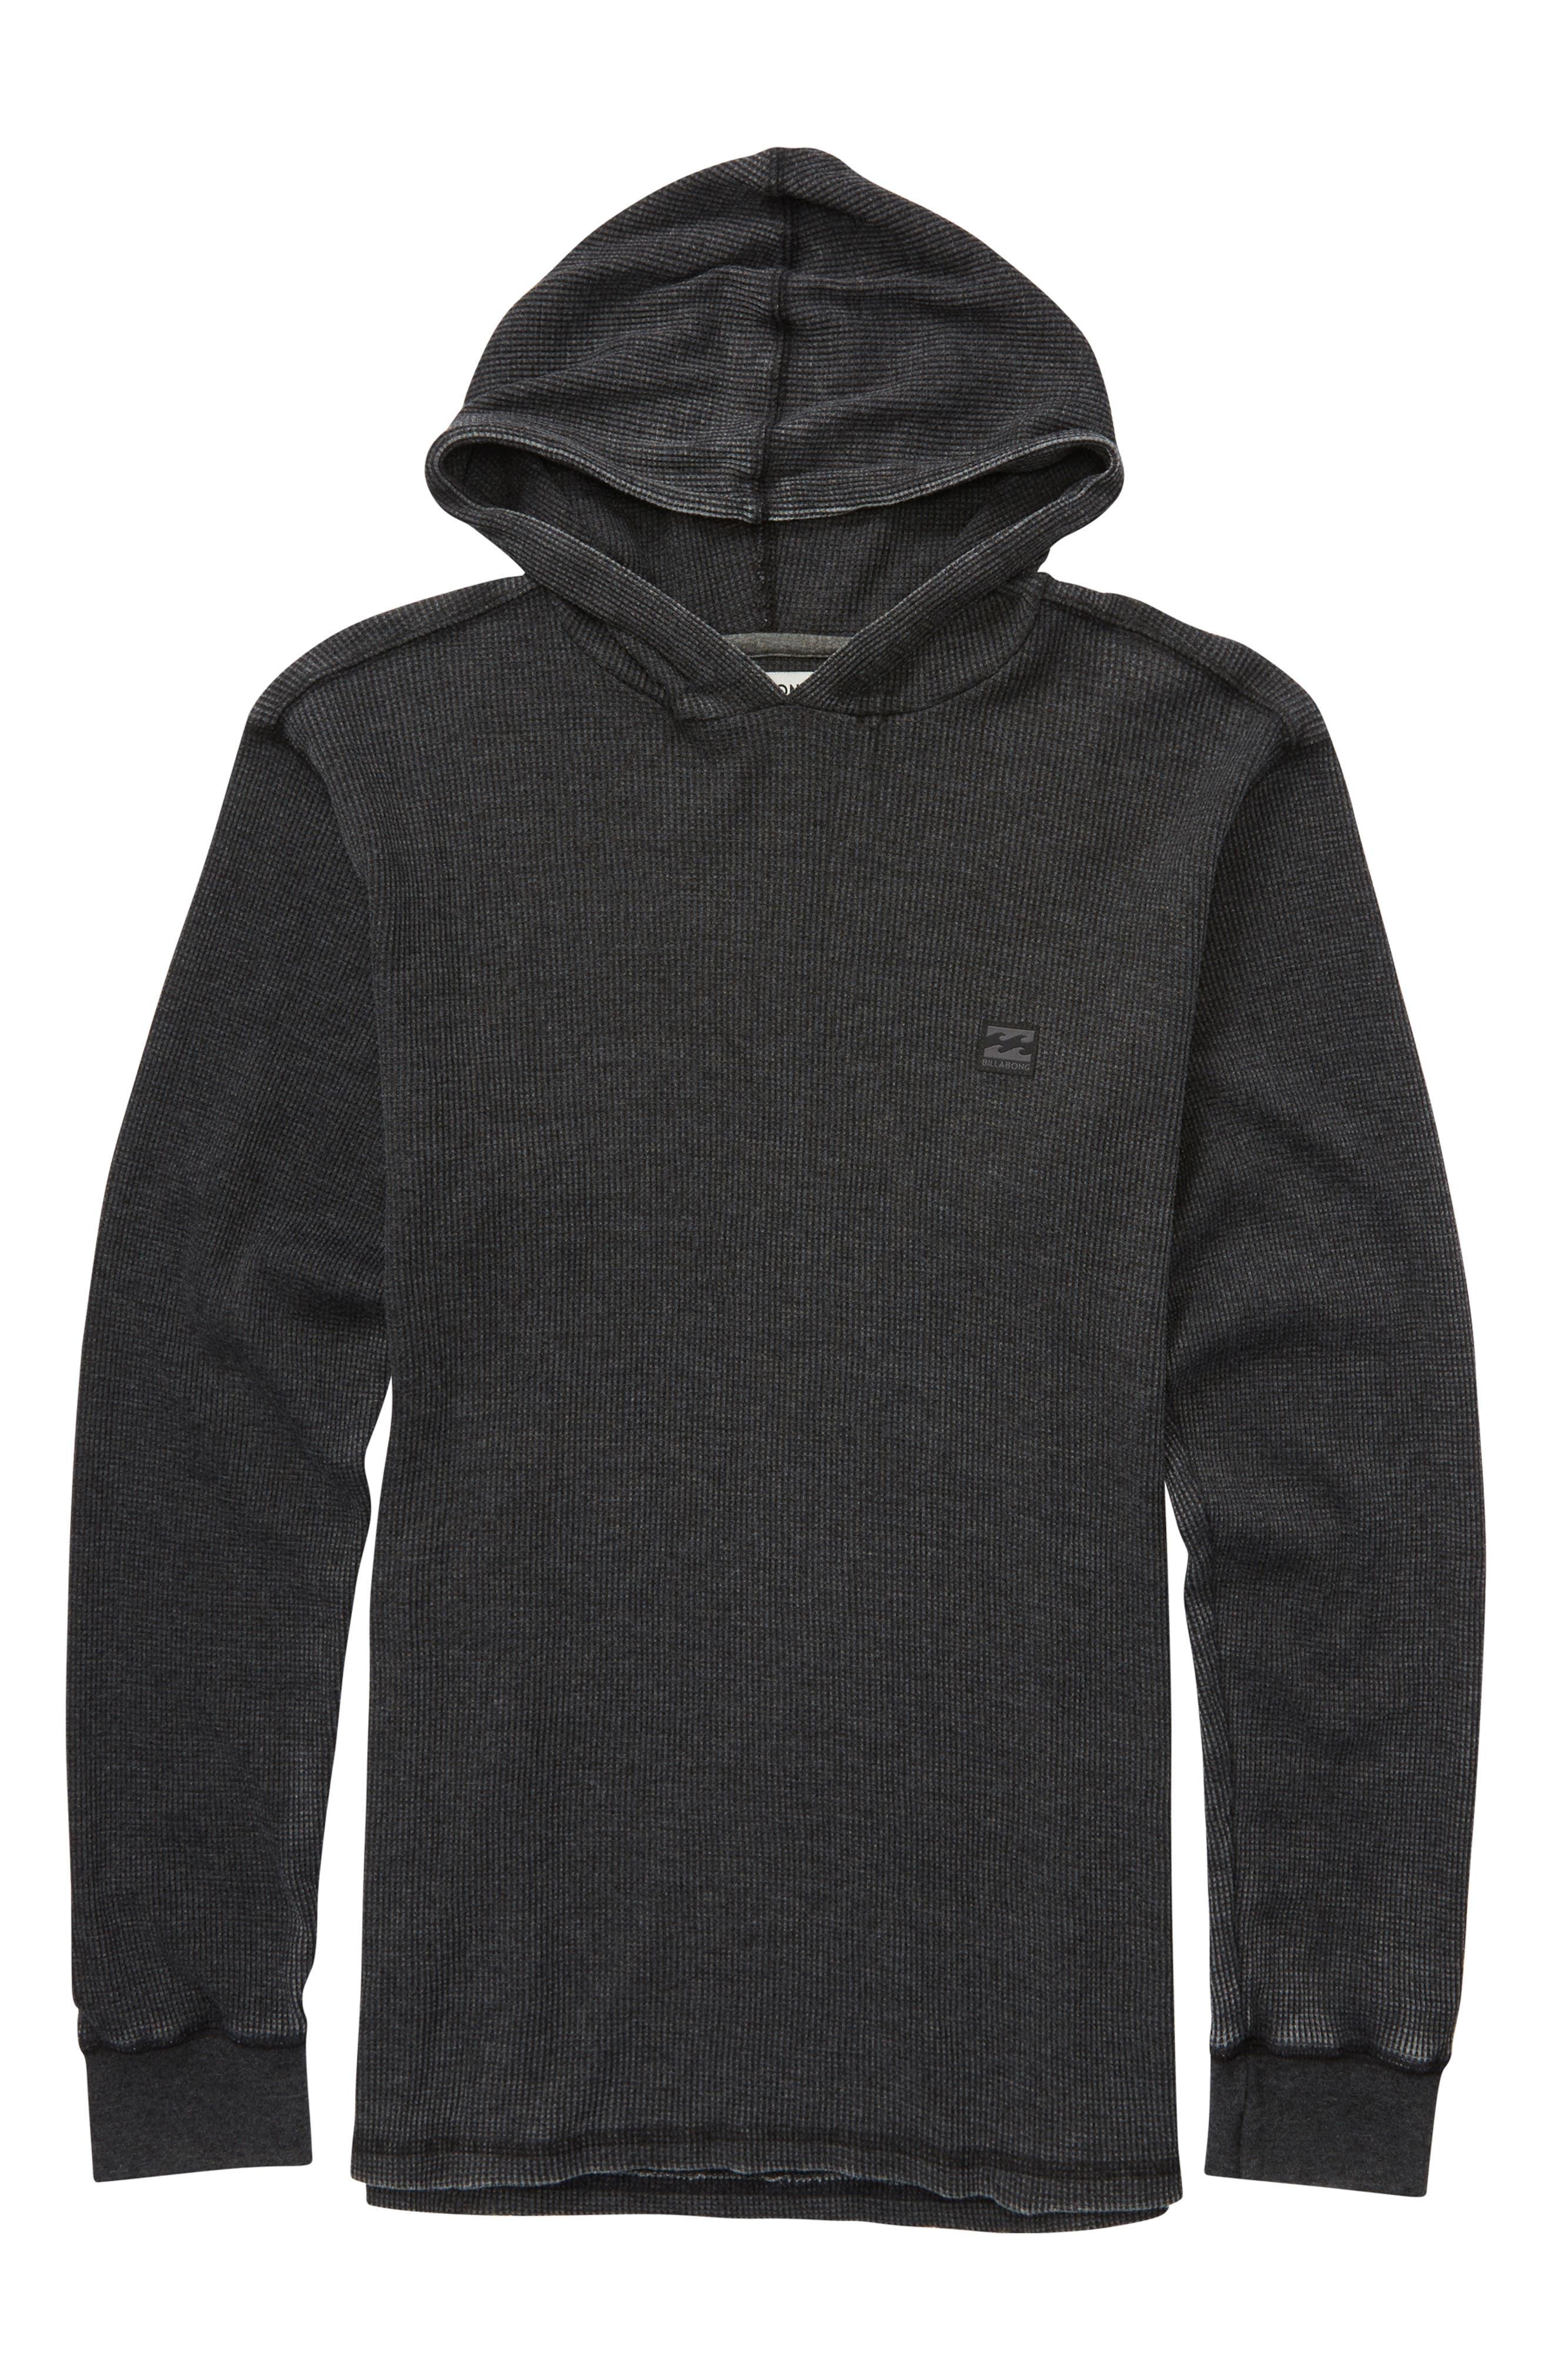 Boys Billabong Keystone Thermal Pullover Hoodie Size L (1416)  Black